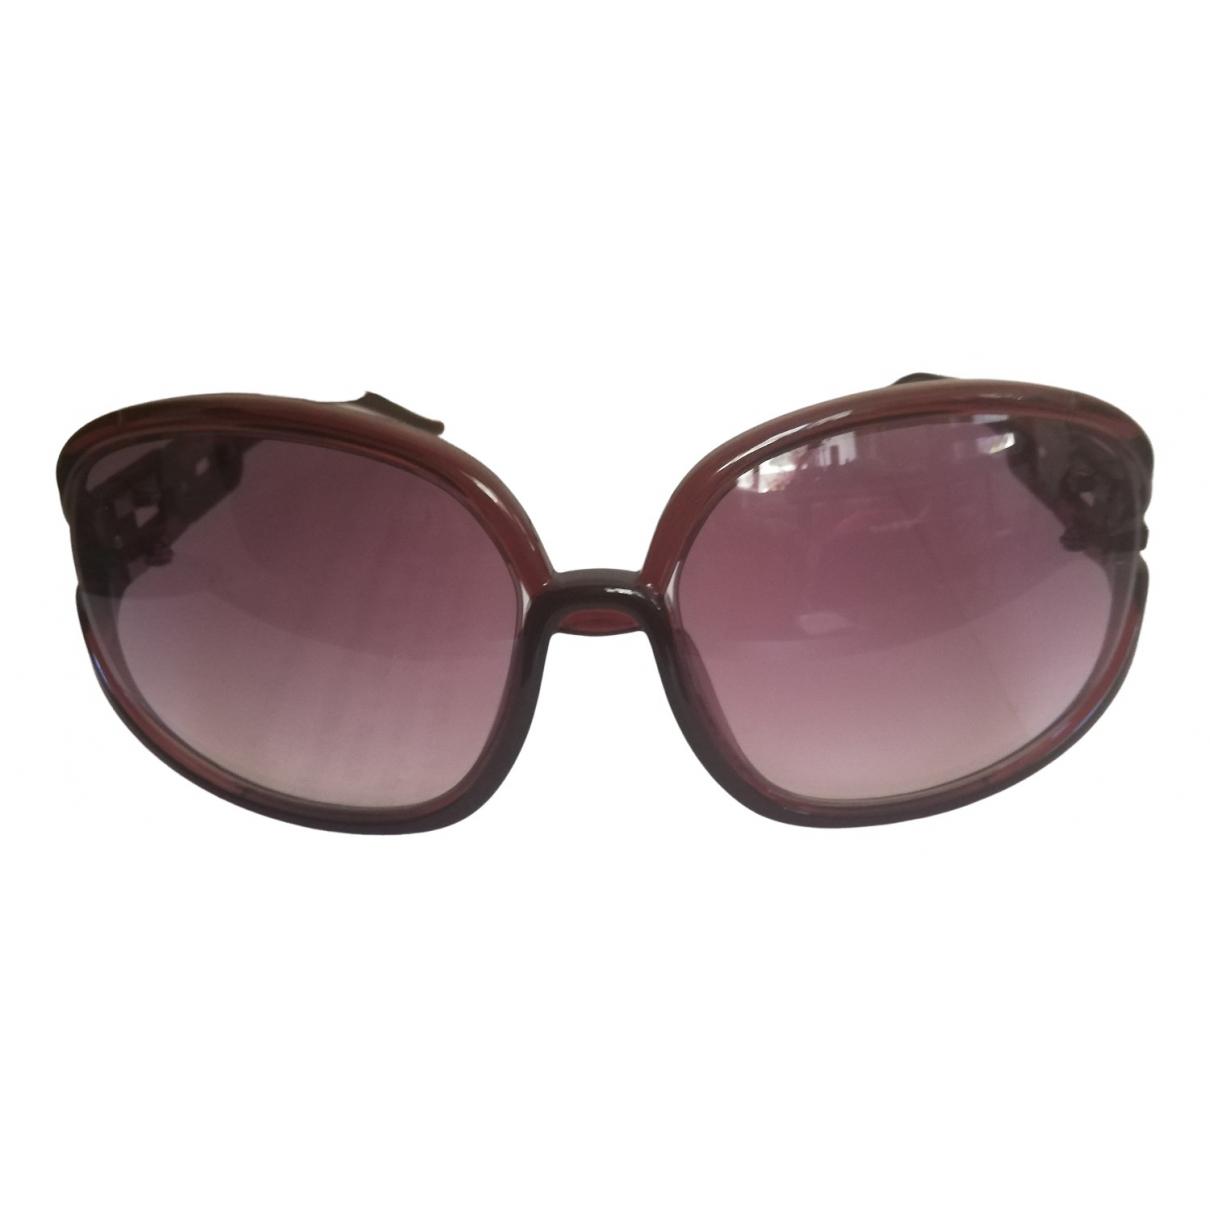 Just Cavalli \N Multicolour Sunglasses for Women \N